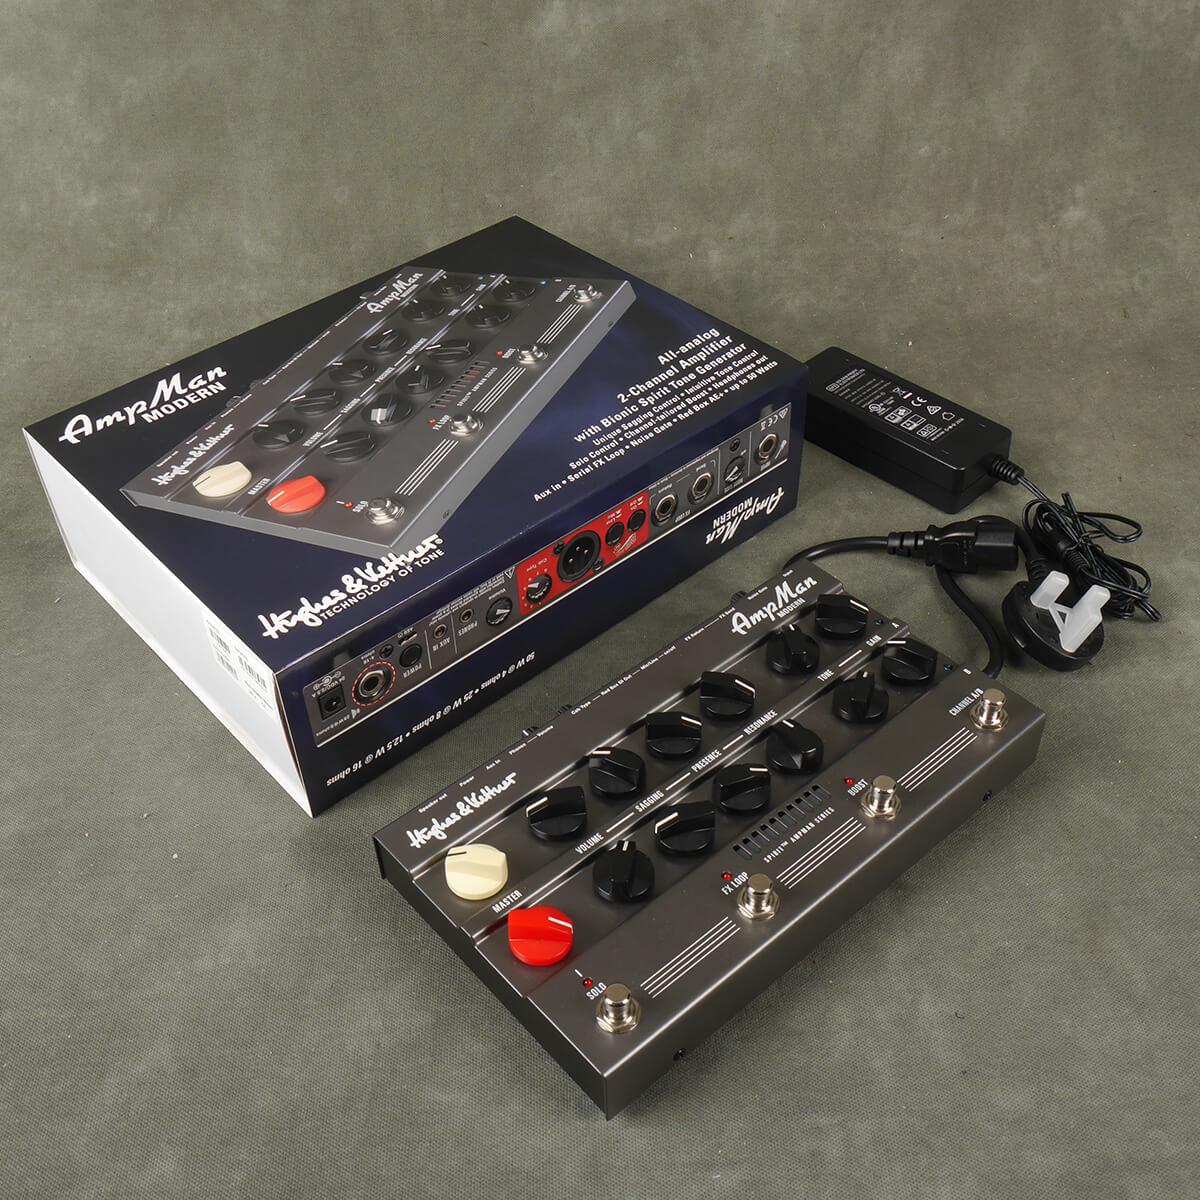 Hughes & Kettner AmpMan Modern Amp Sim w/Box & PSU - 2nd Hand